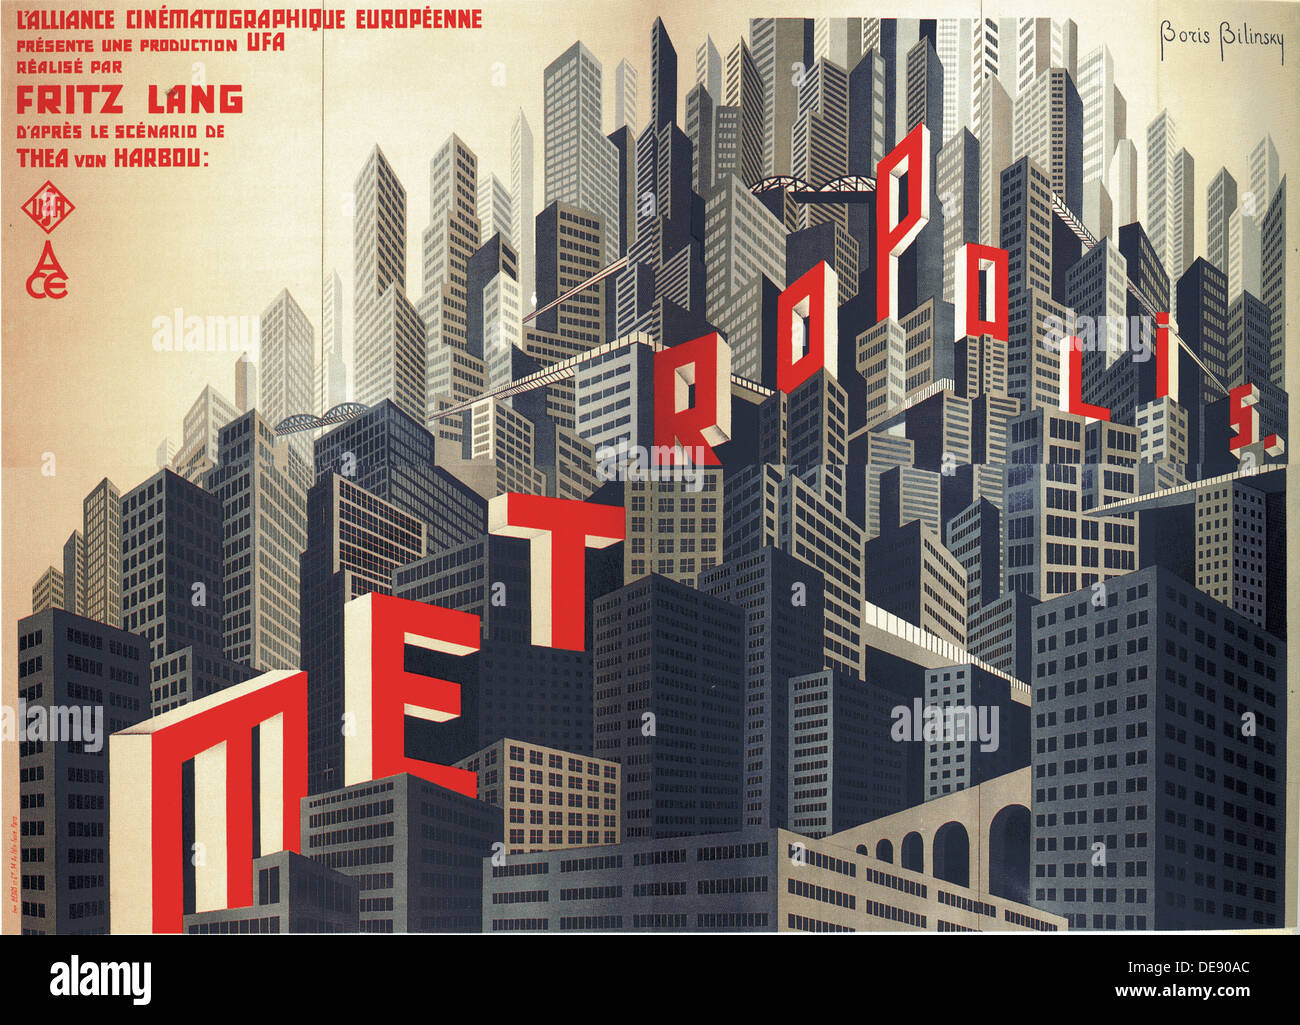 Movie poster Metropolis by Fritz Lang, 1926. Artist: Bilinsky, Boris Konstantinovich (1900-1948) - Stock Image